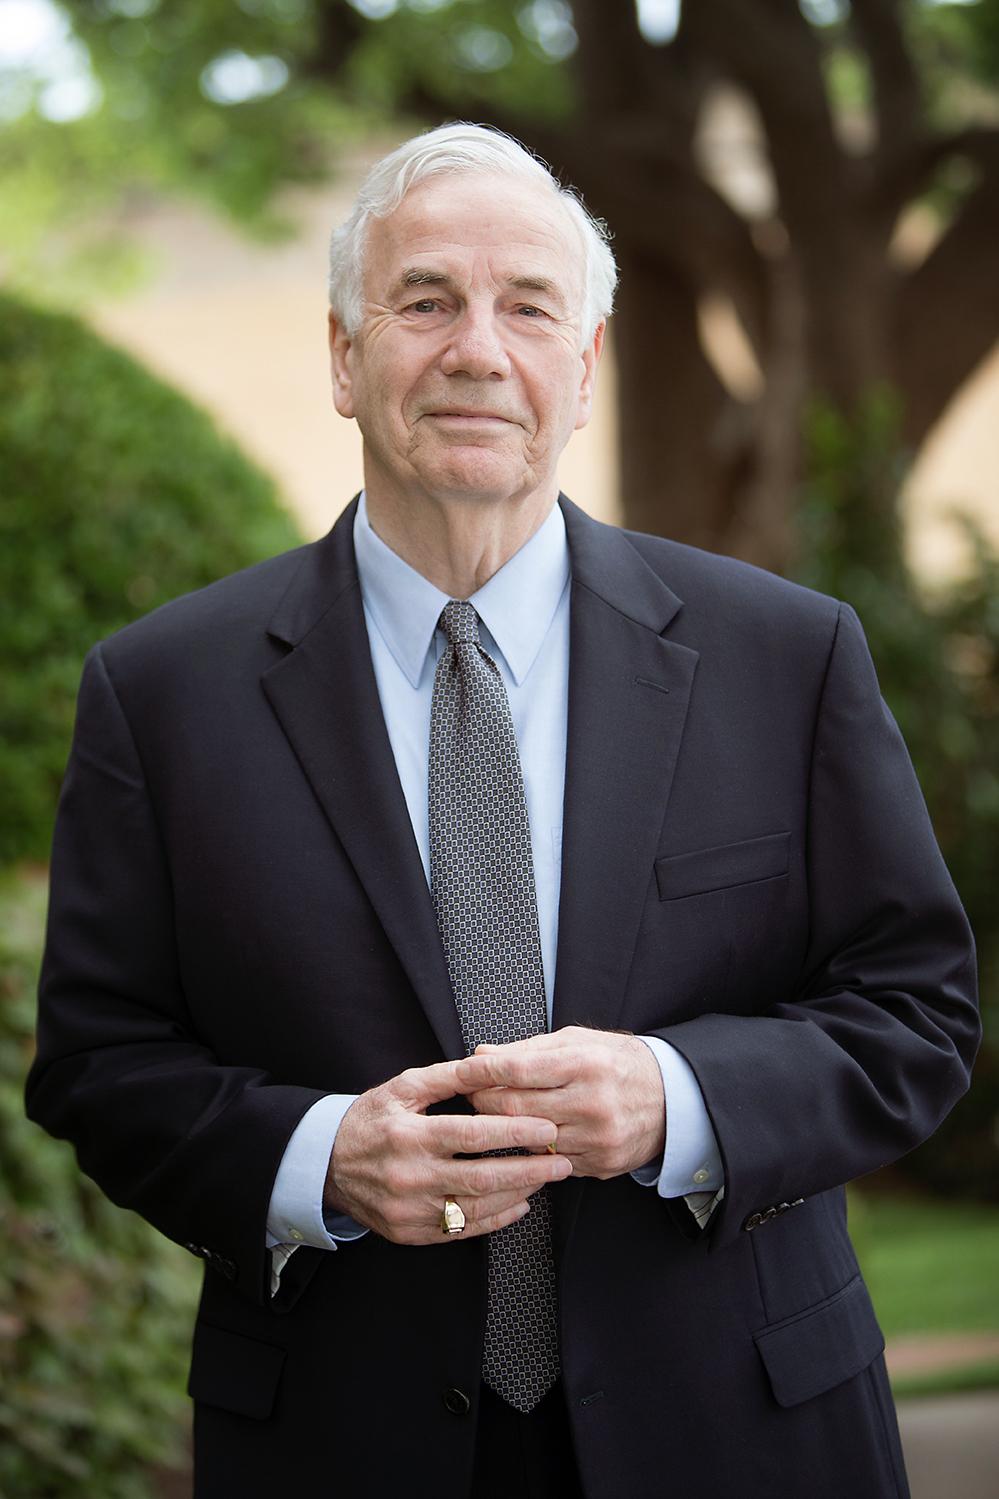 M. Glen Mullins